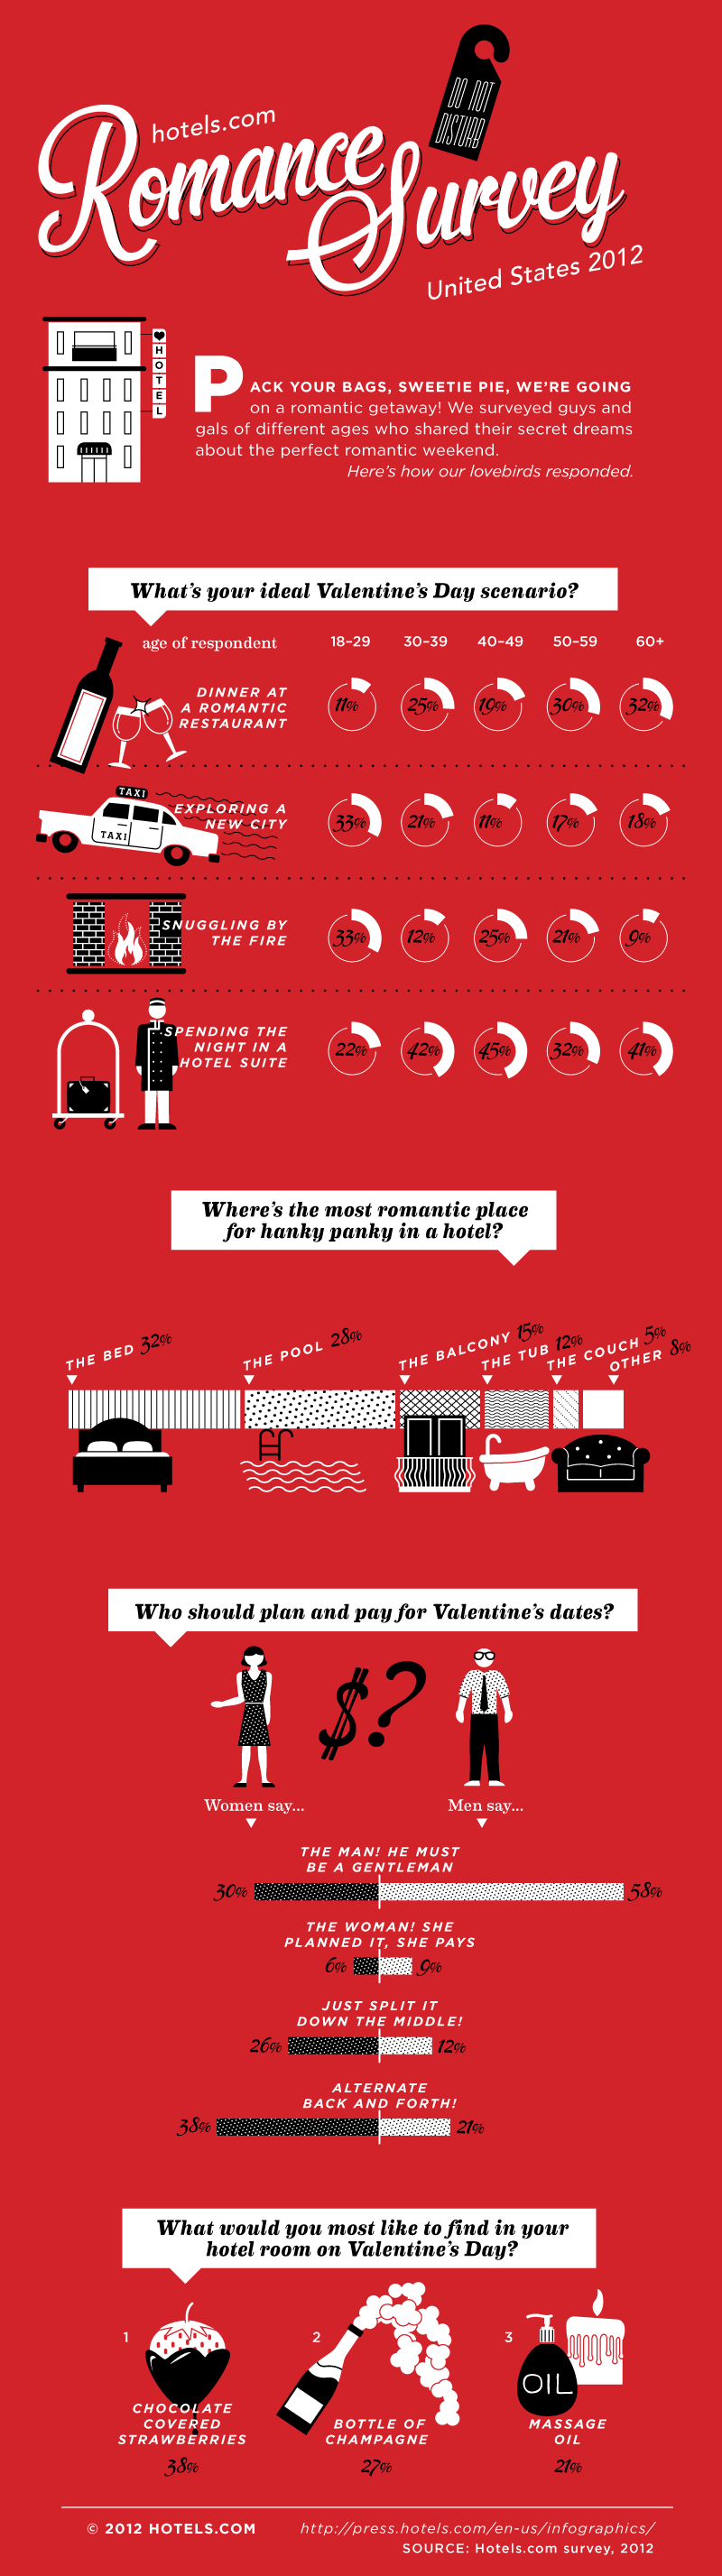 Hotels.com 2012 Romance Survey results